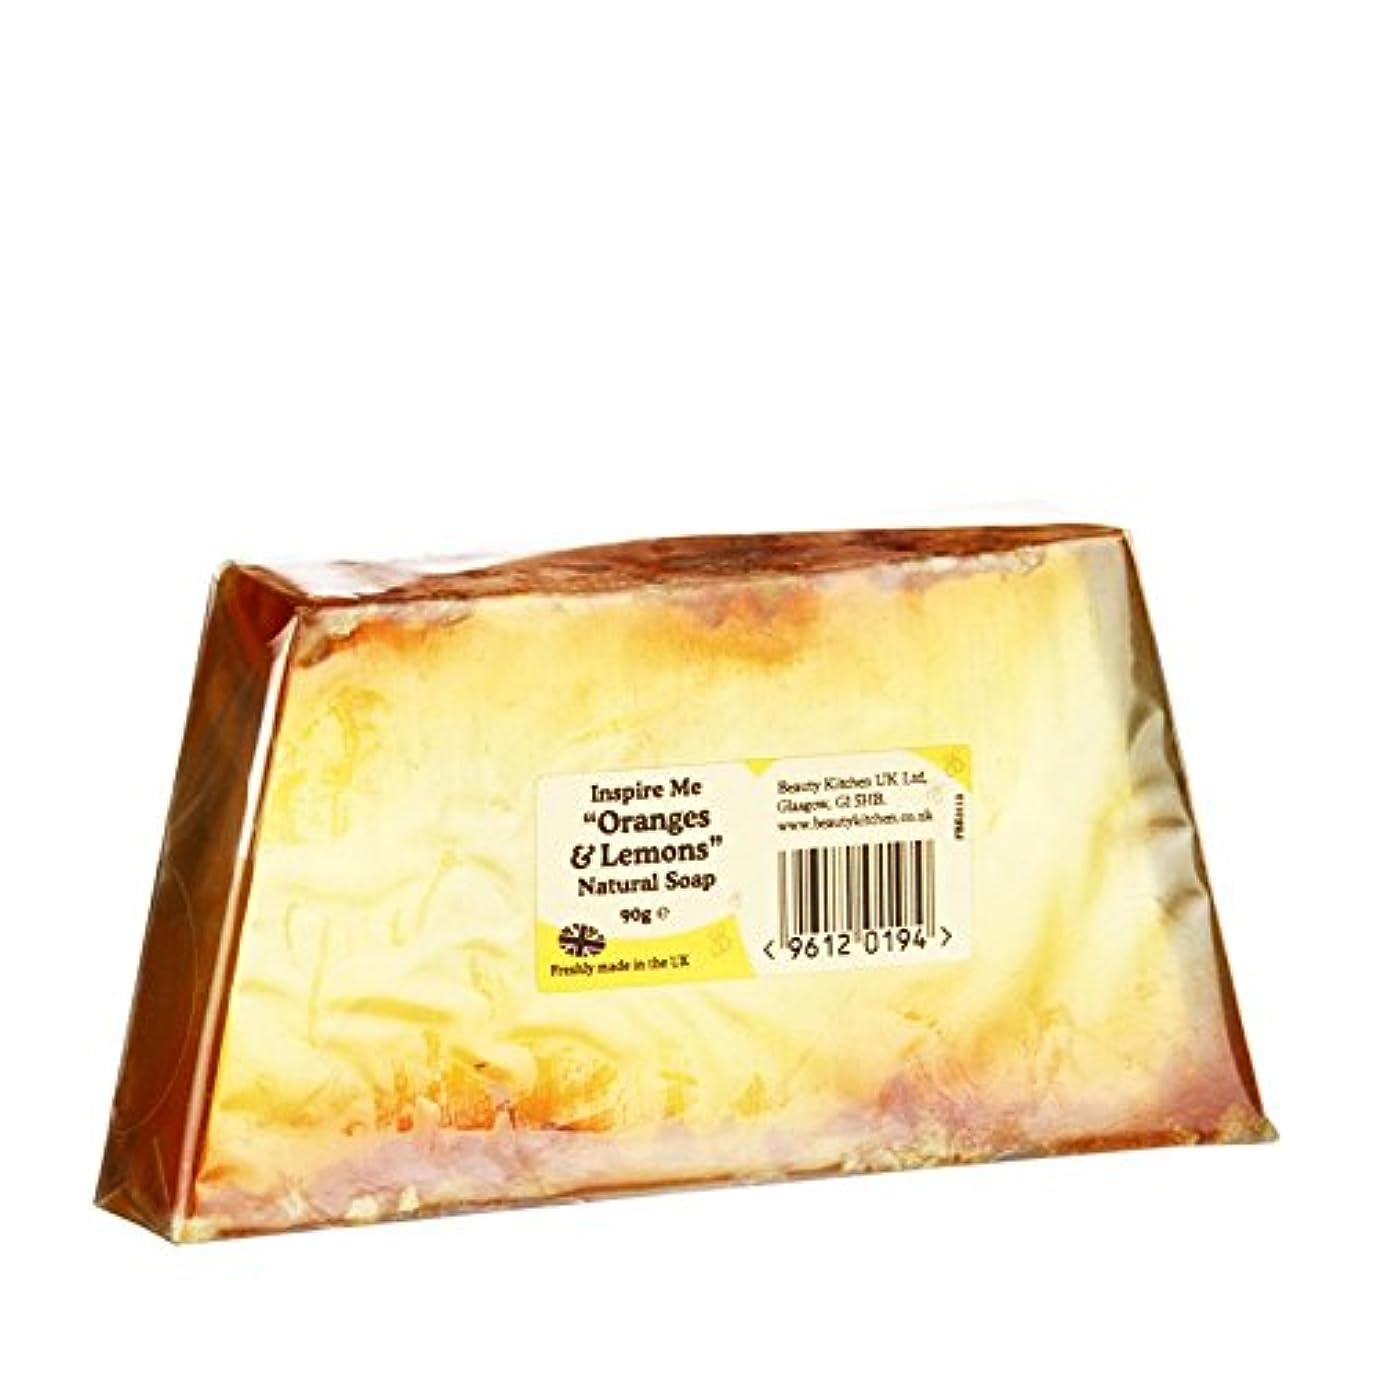 Beauty Kitchen Inspire Me Orange & Lemon Natural Soap 90g (Pack of 2) - 美しさのキッチンは私がオレンジ&レモンの天然石鹸90グラム鼓舞します (x2...